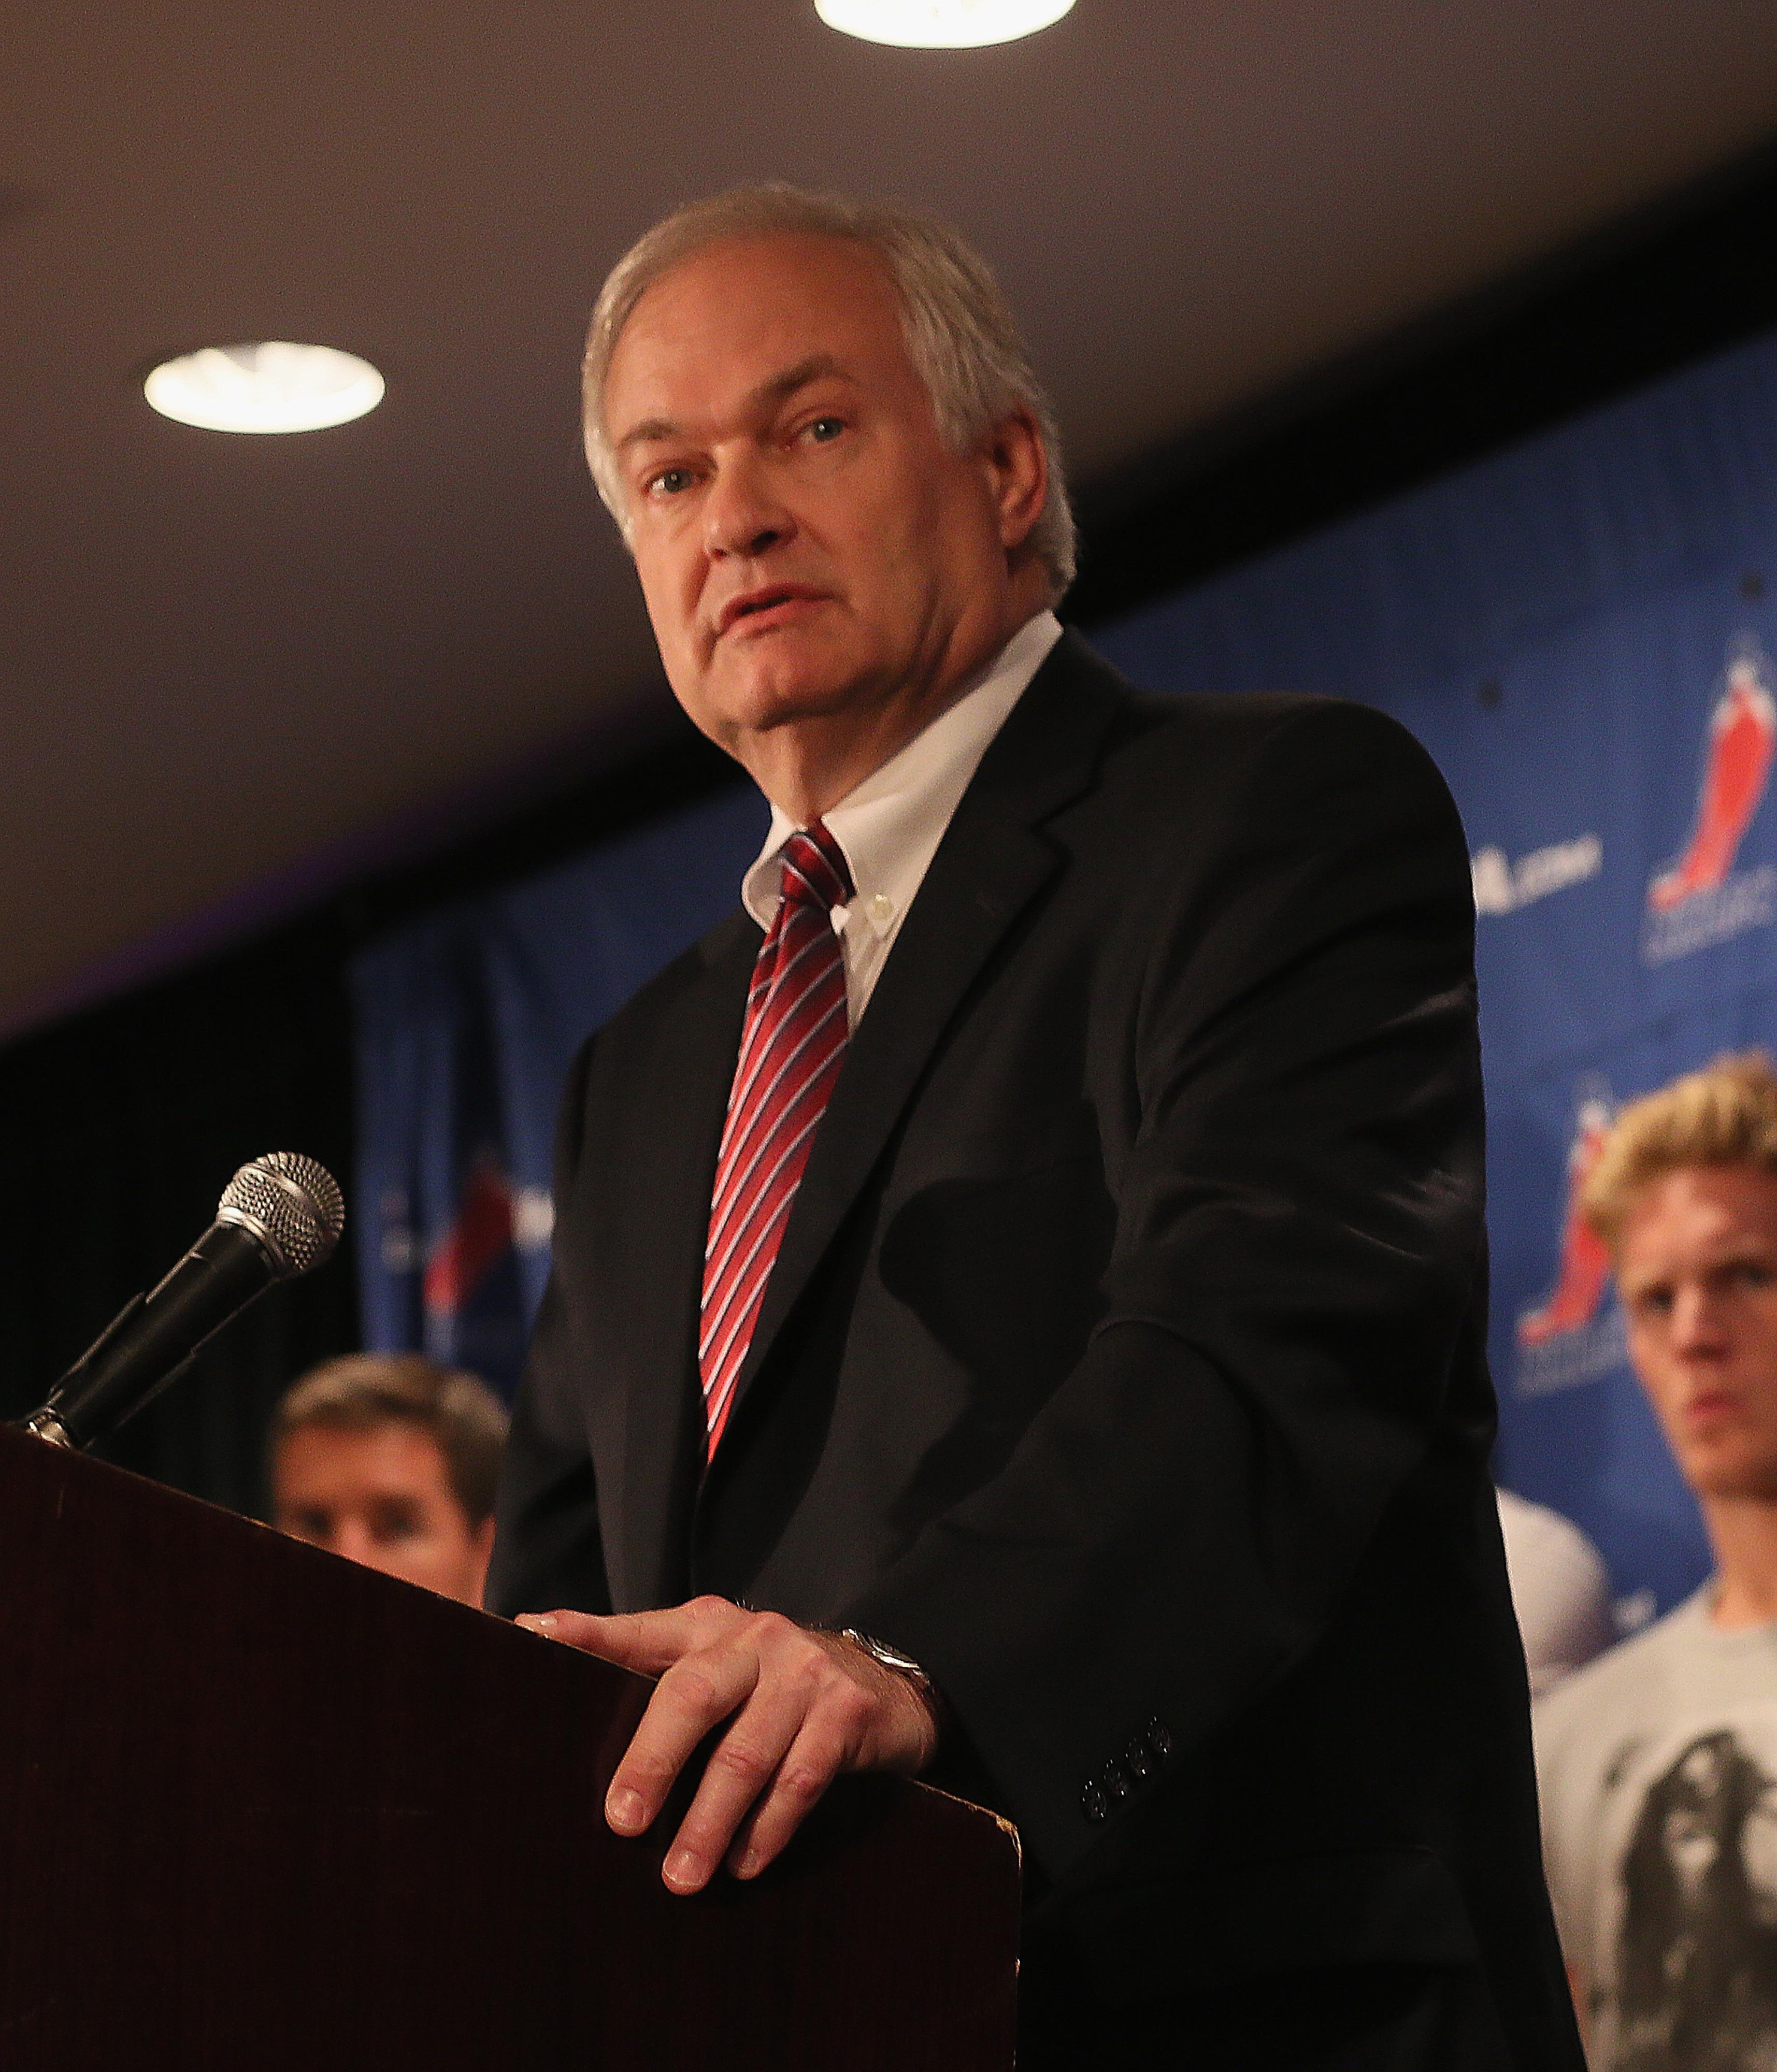 NHLPA Executive Director Don Fehr